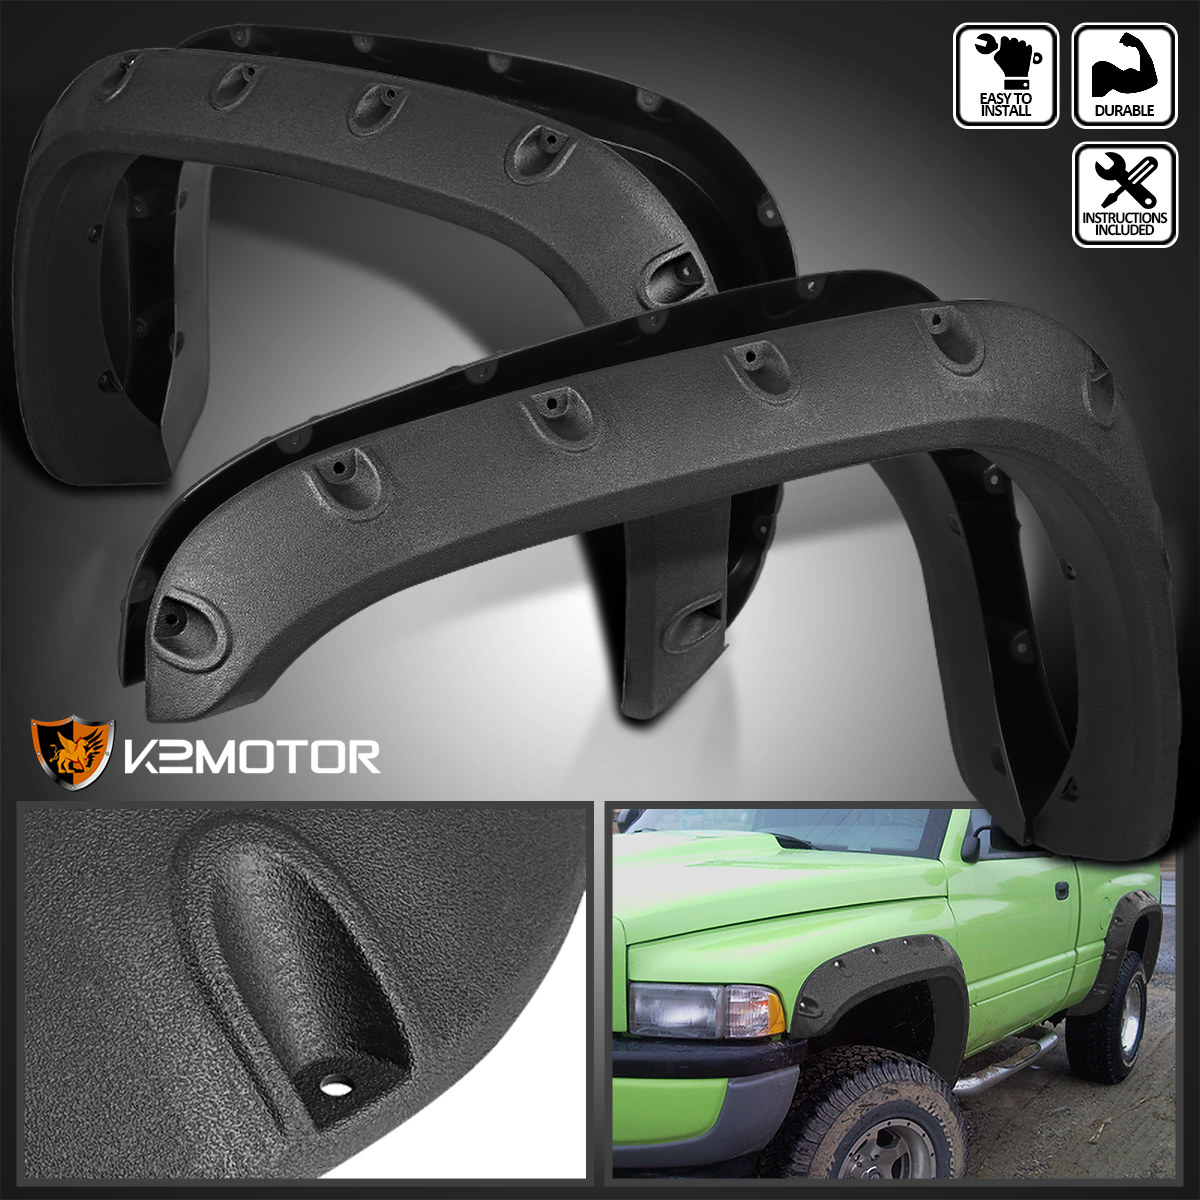 Spec-D Tuning For Dodge Ram 1500 2500 3500 Rough Texture Pocket Rivet Wheel Fender Flares